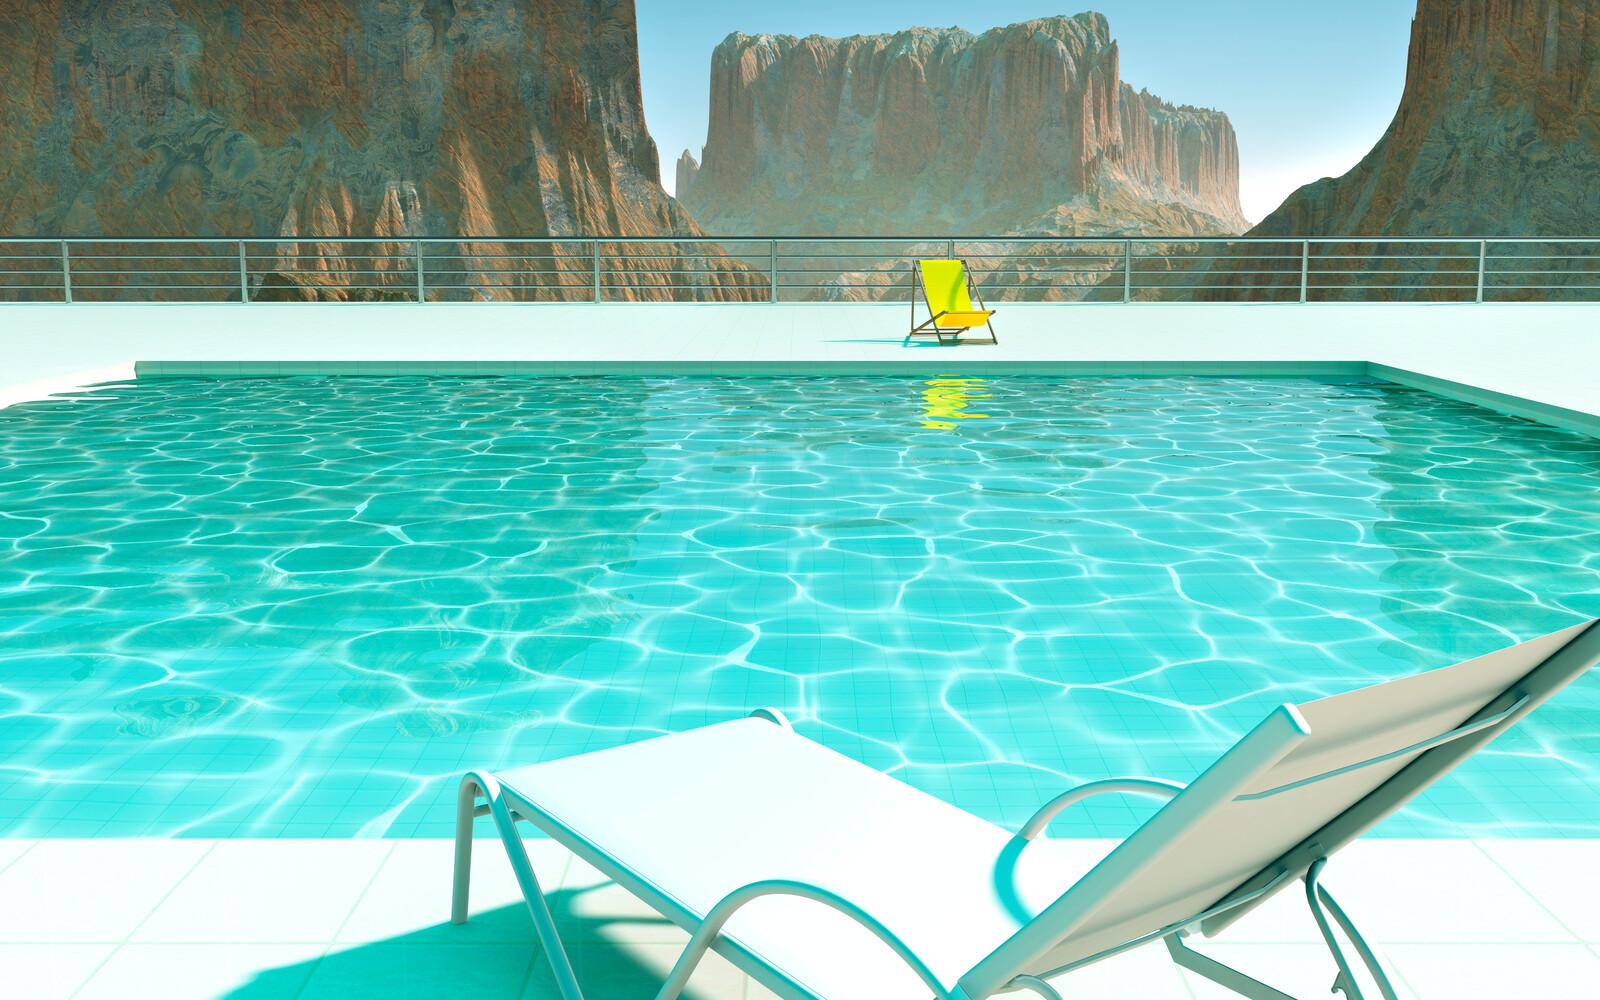 Pool 11 - Carl Miller